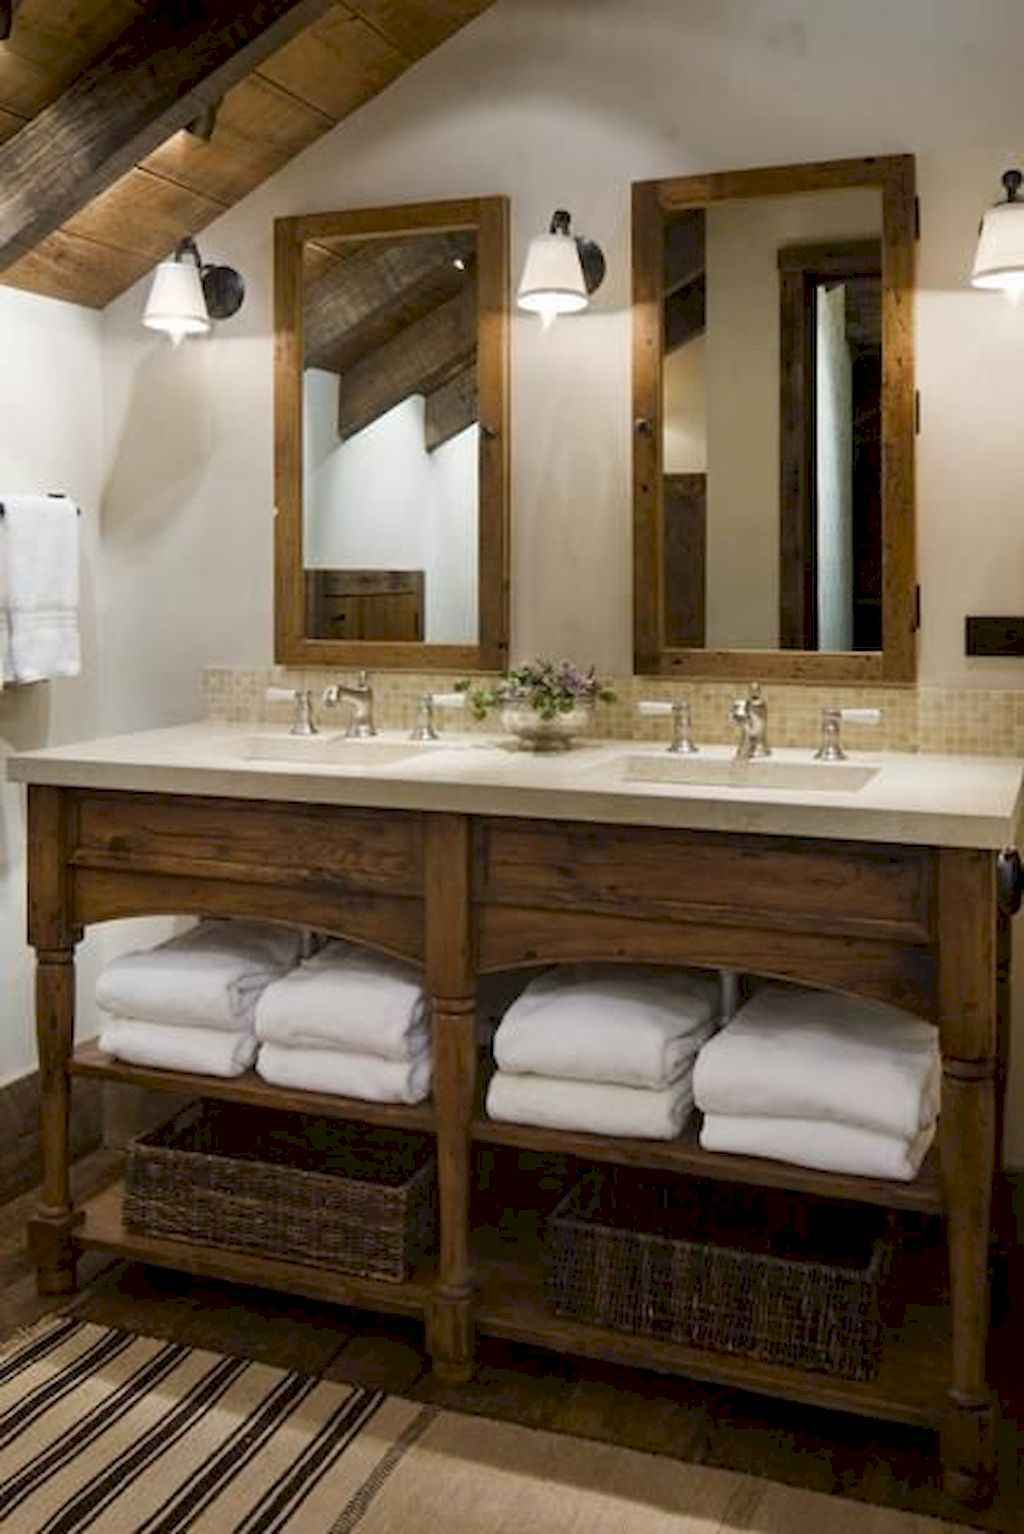 125 awesome farmhouse bathroom vanity remodel ideas (34)